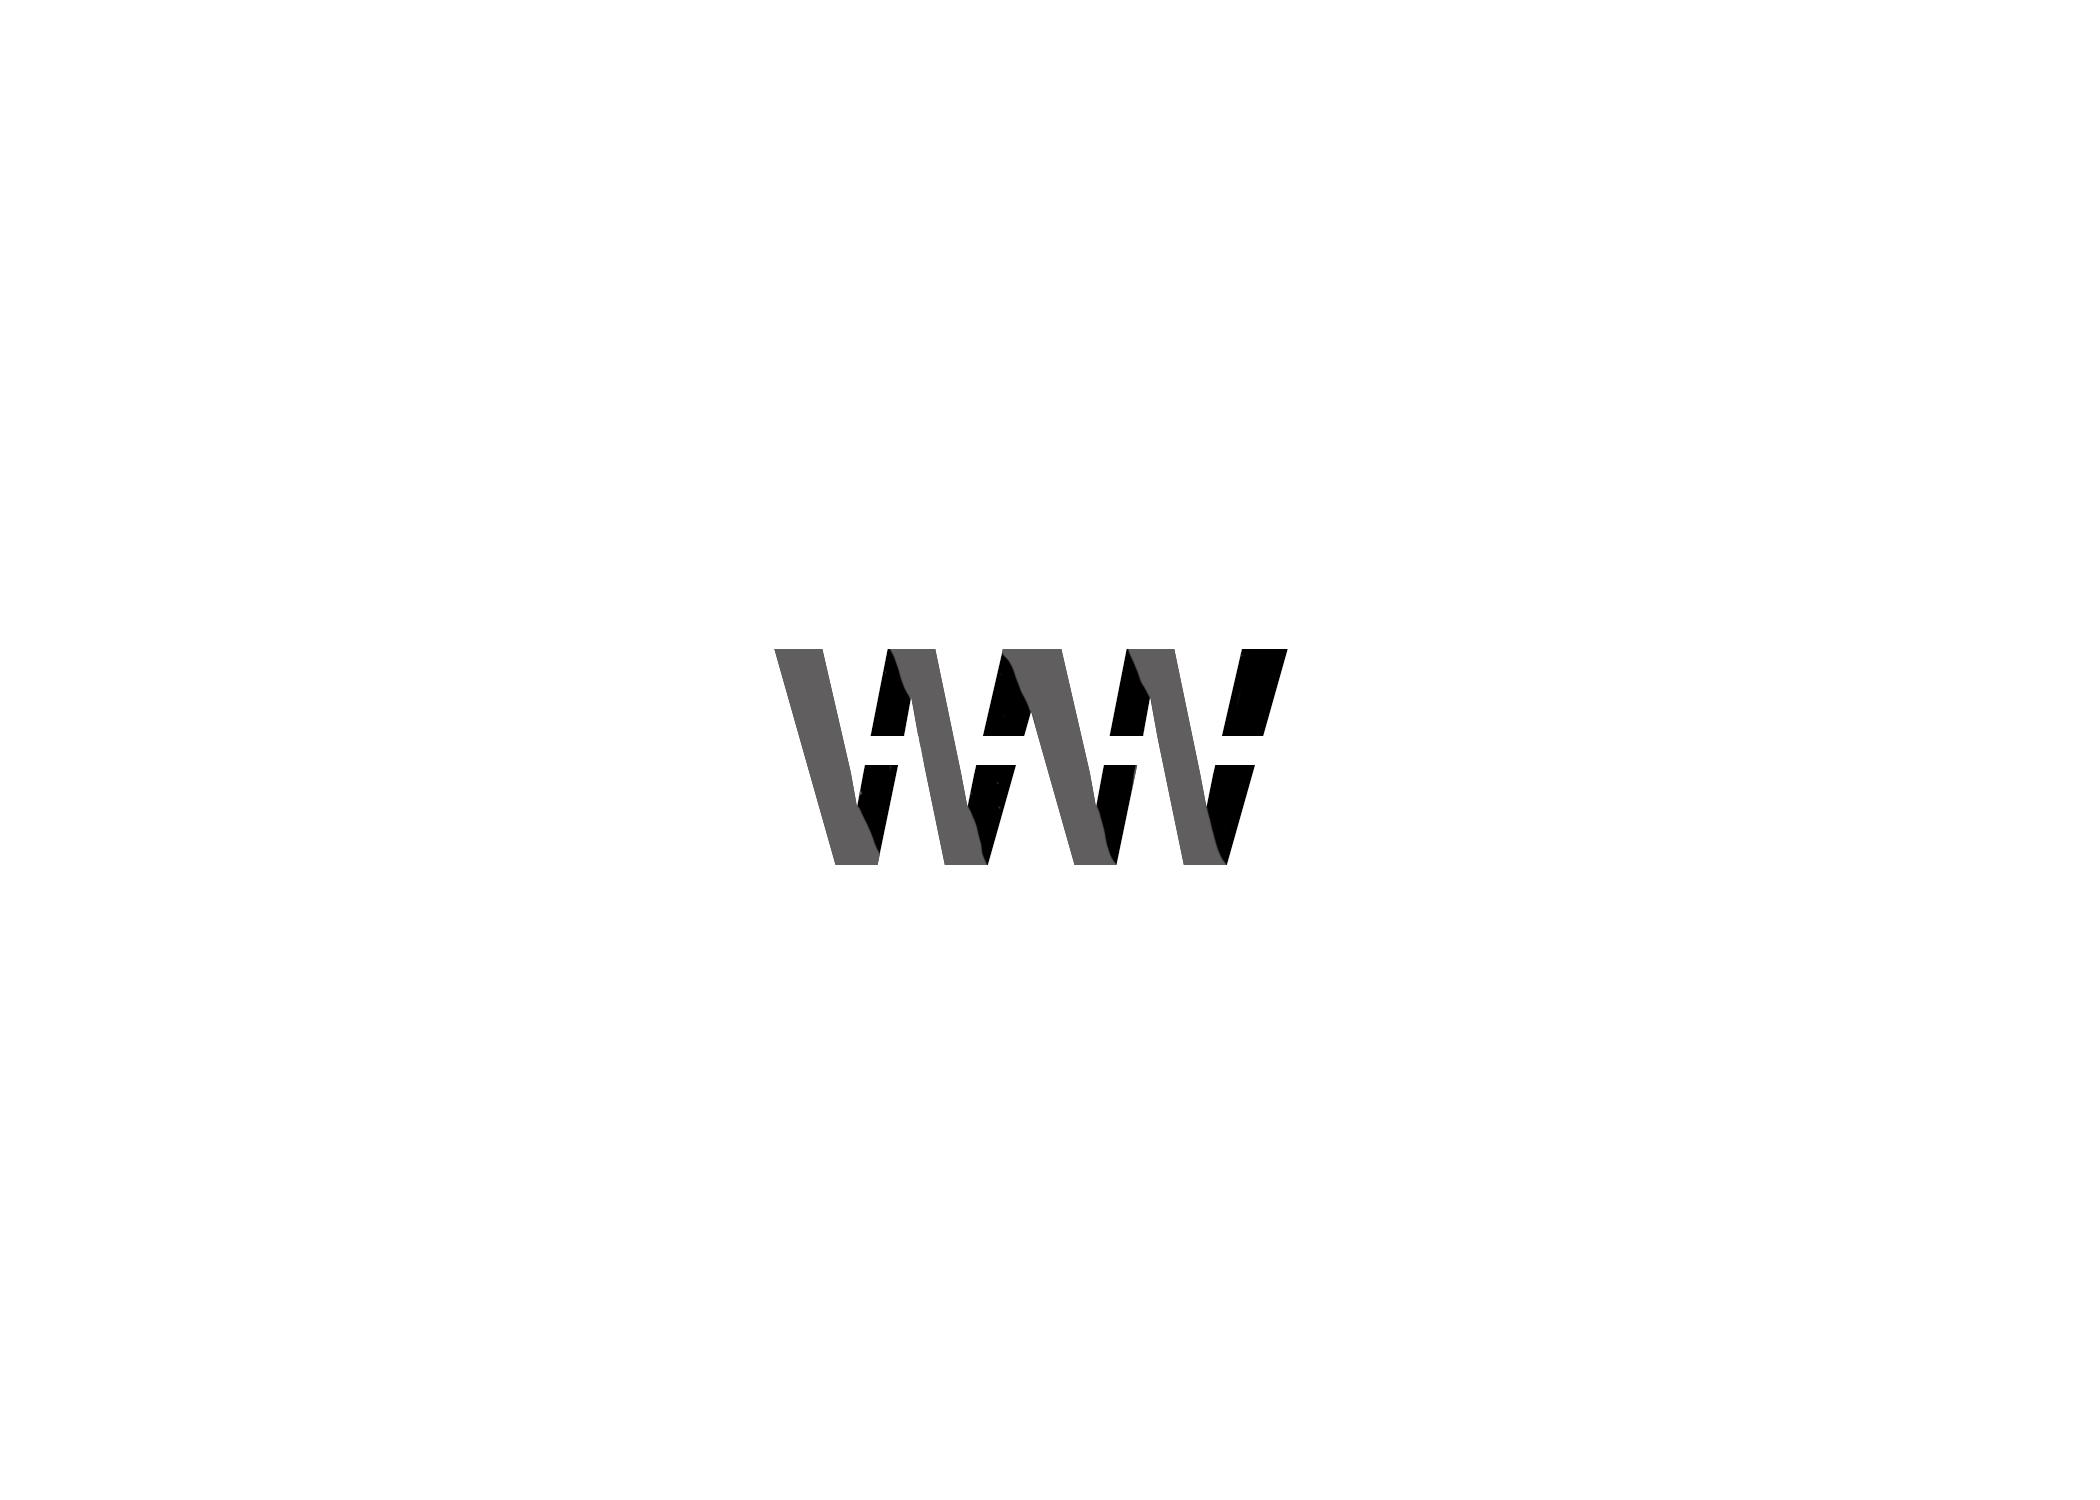 ANDREW WOLFE LOGO V1